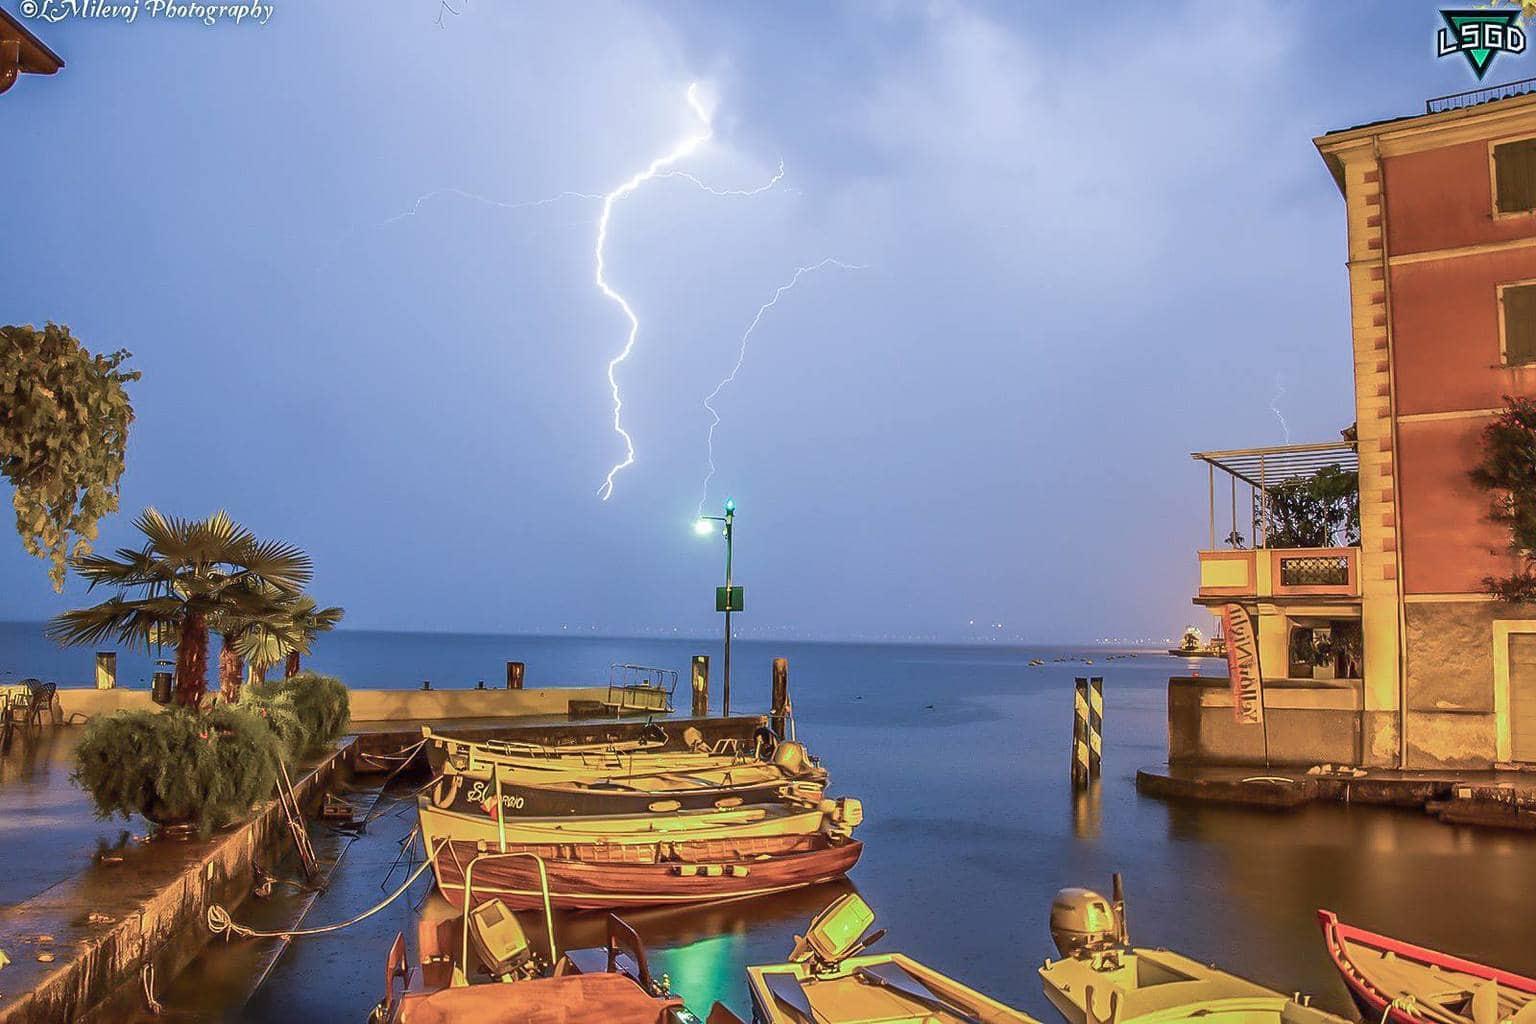 Quite port of Limone sul Garda and lightining (Lake Garda on 9 august 2014